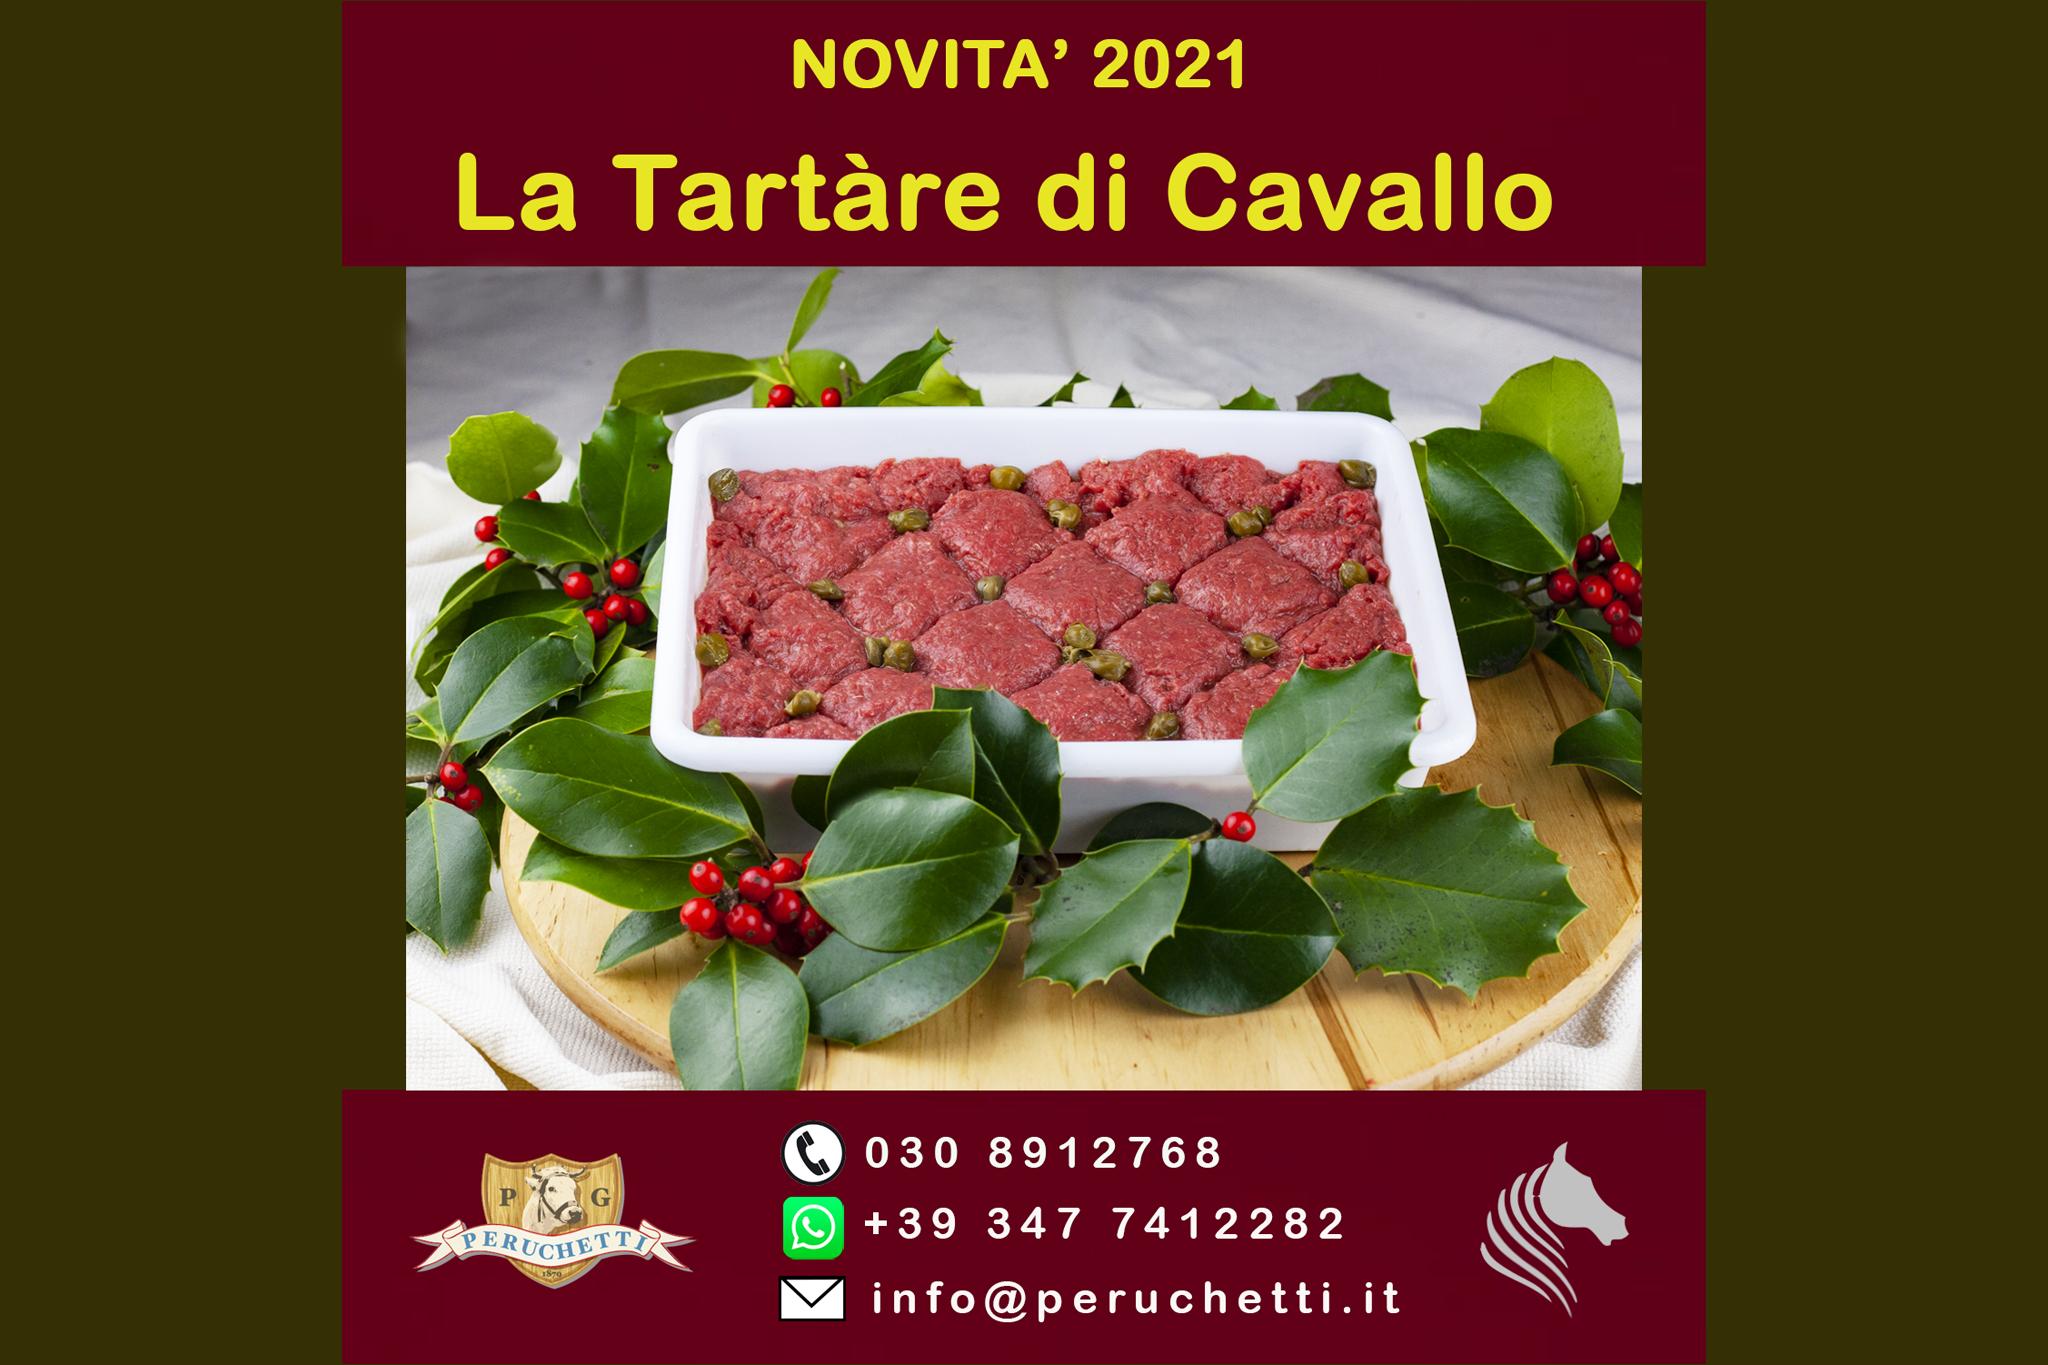 Macelleria_Peruchetti_Equino_Febbraio_Tartare_2021_Landing